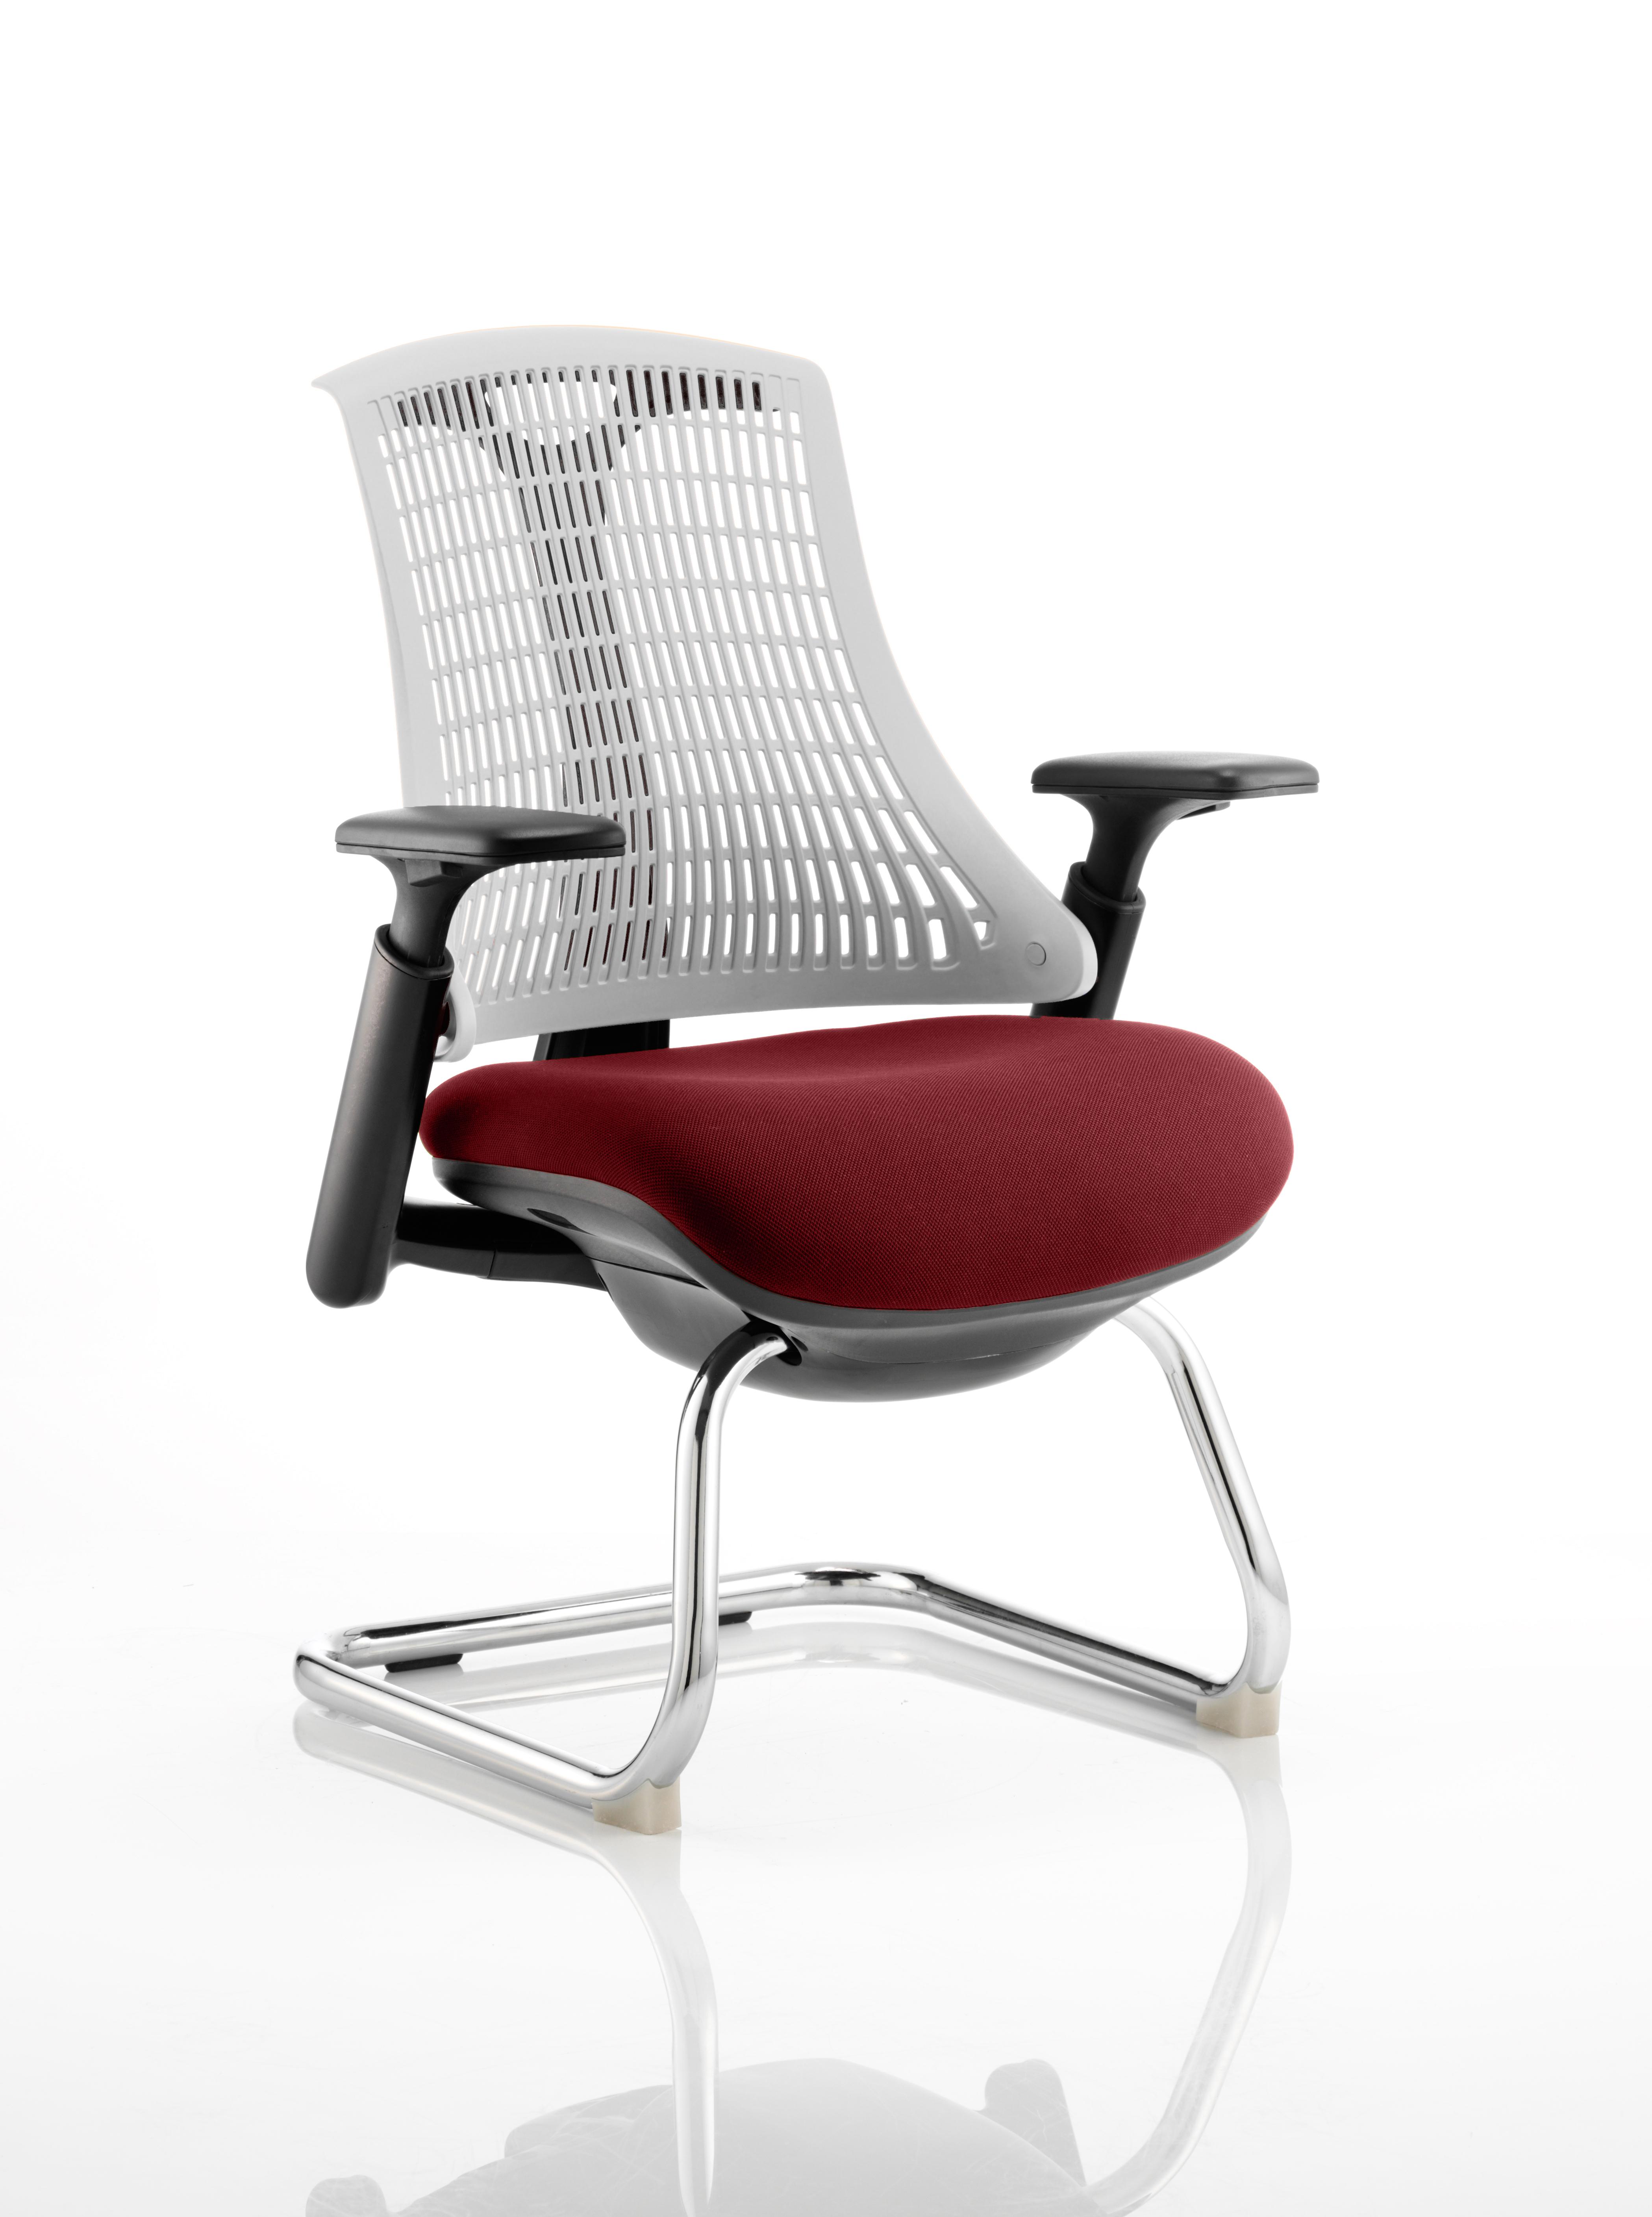 Flex Cantilever Chair Black Frame White Back Bespoke Colour Seat Ginseng Chilli